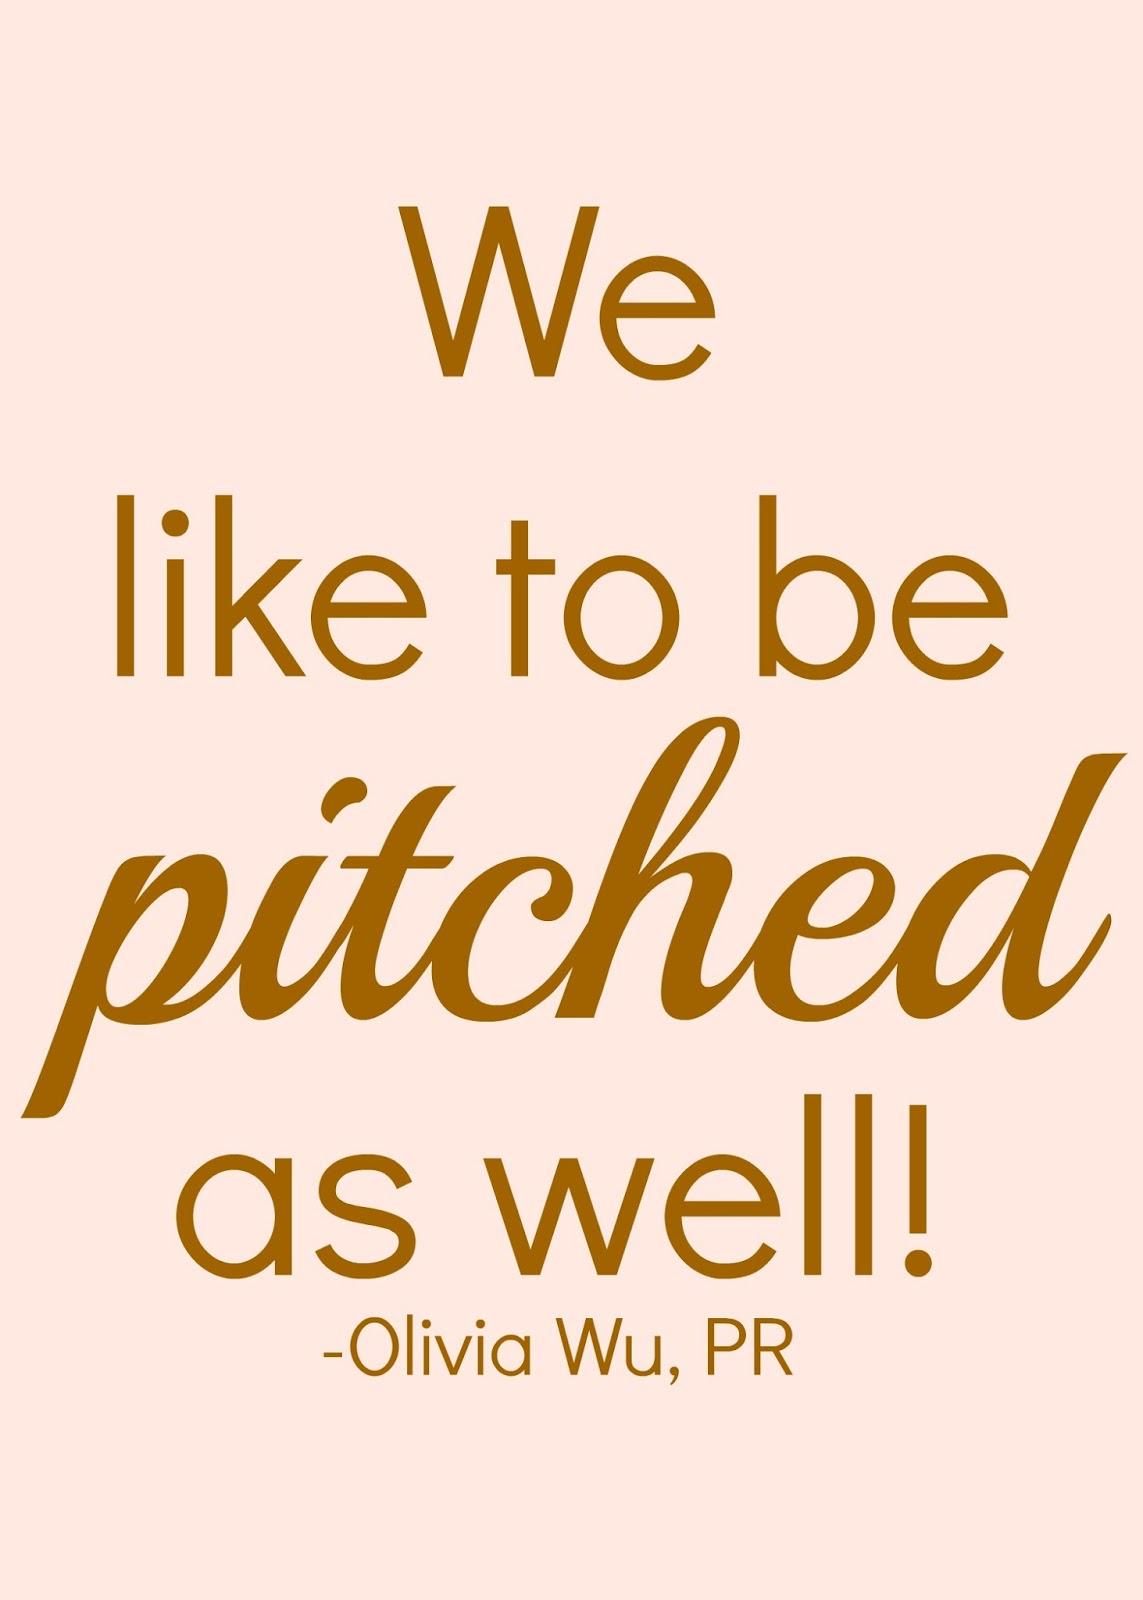 PR and blogging